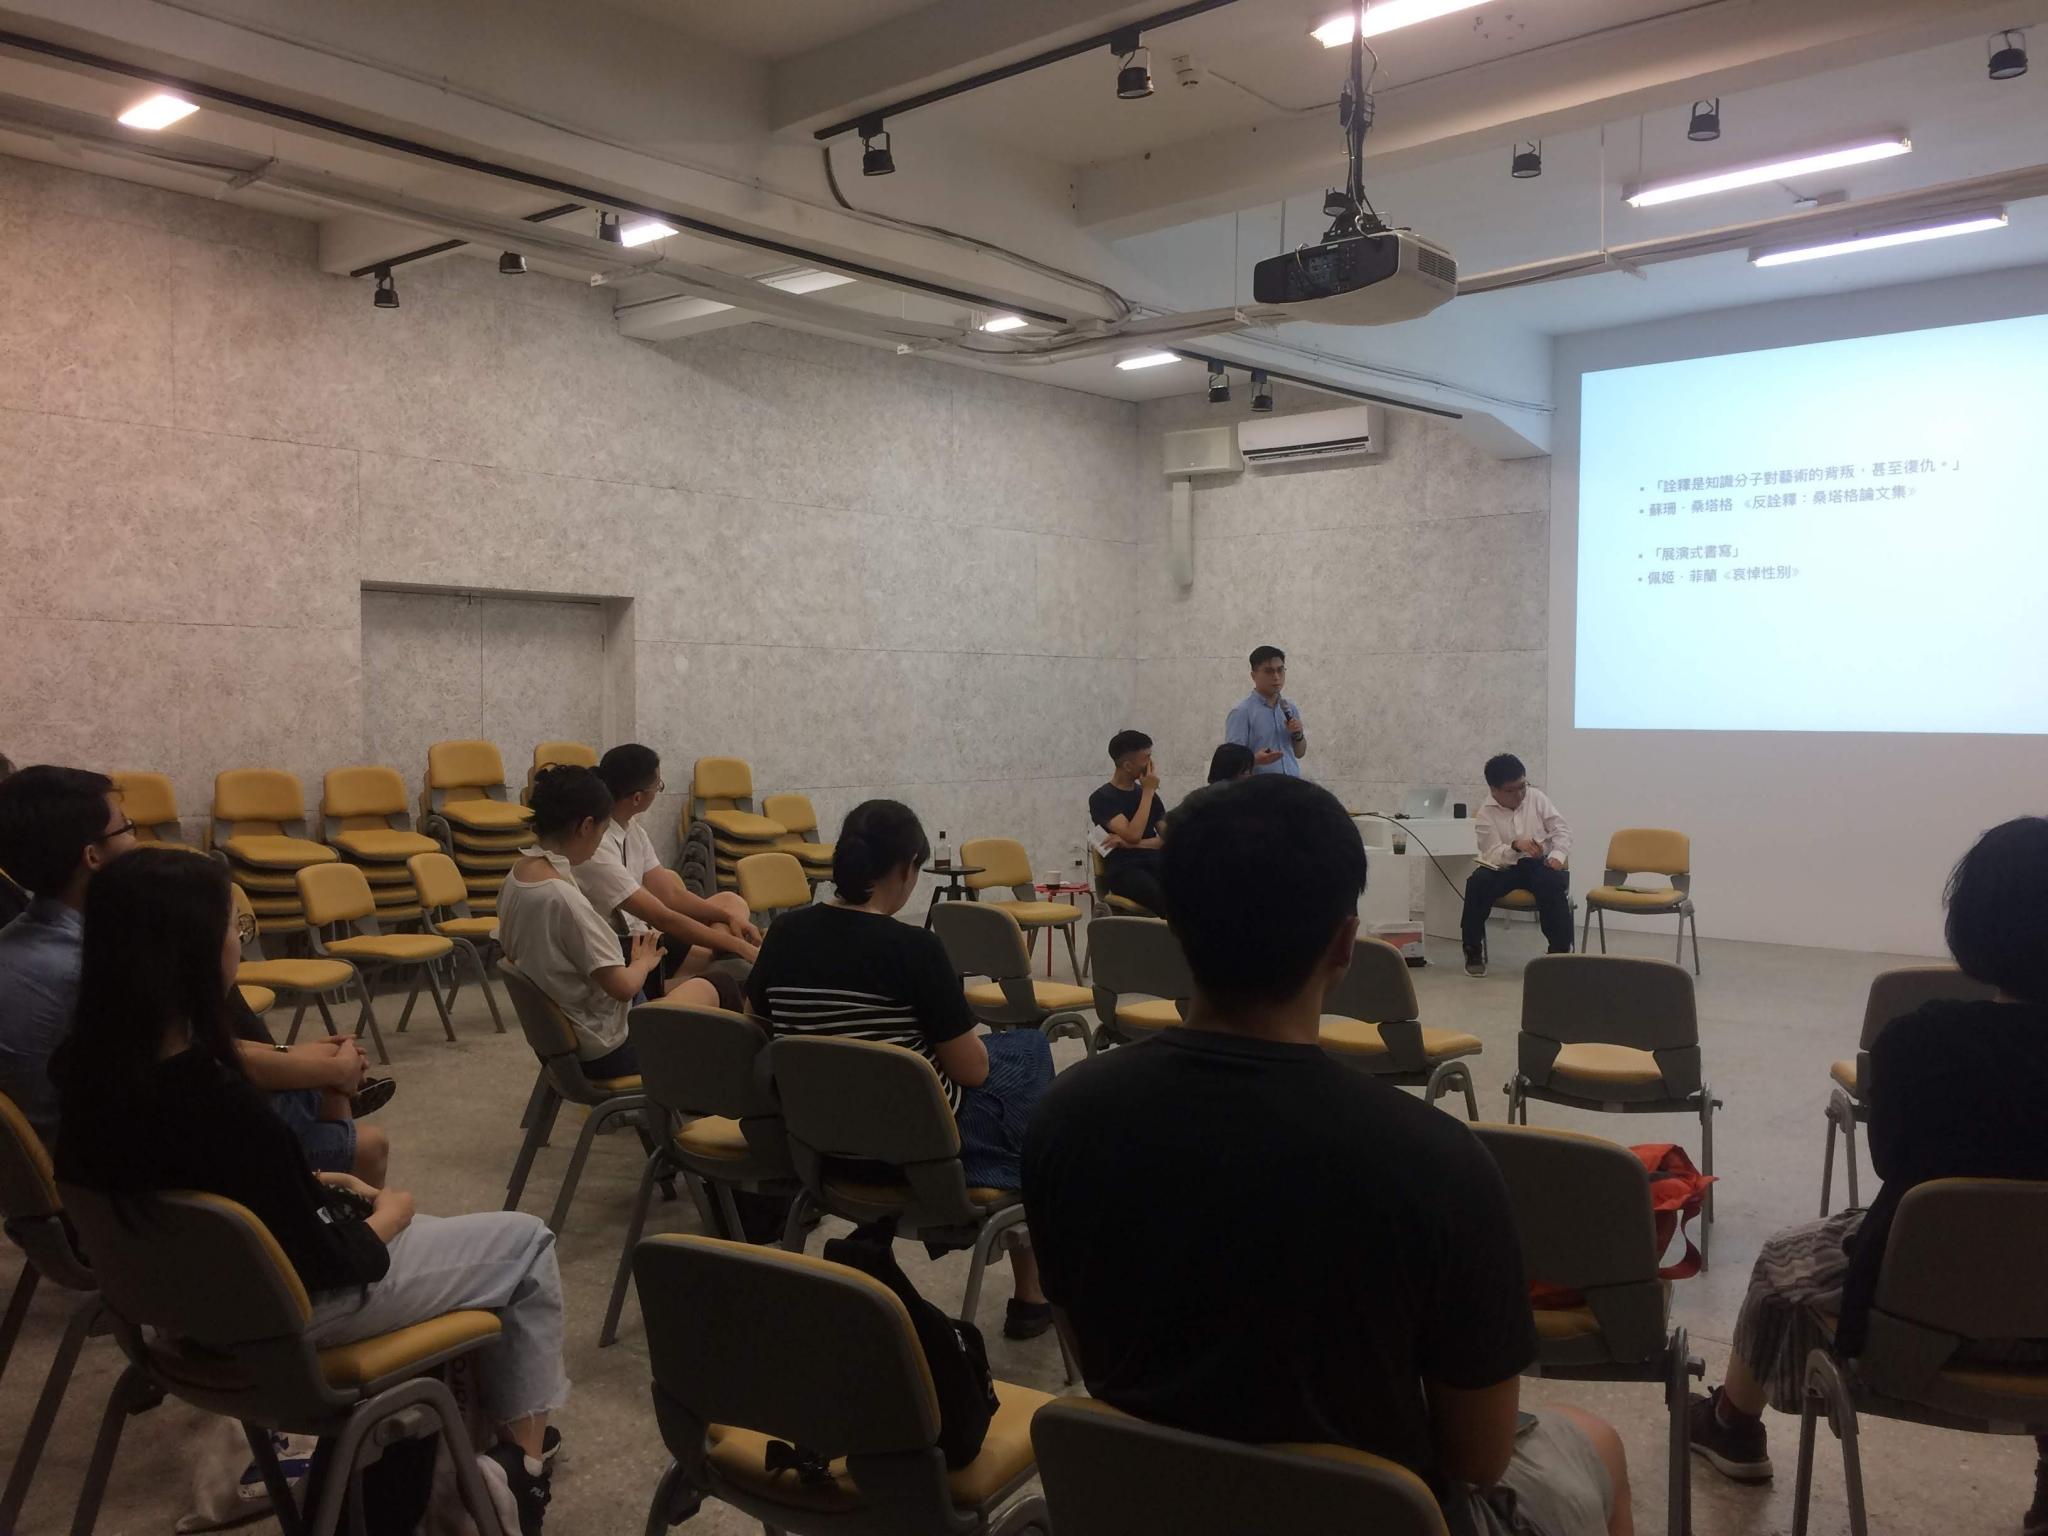 「IATC TW 2019年度論壇」活動照片(照片由國際劇評人協會台灣分會提供)